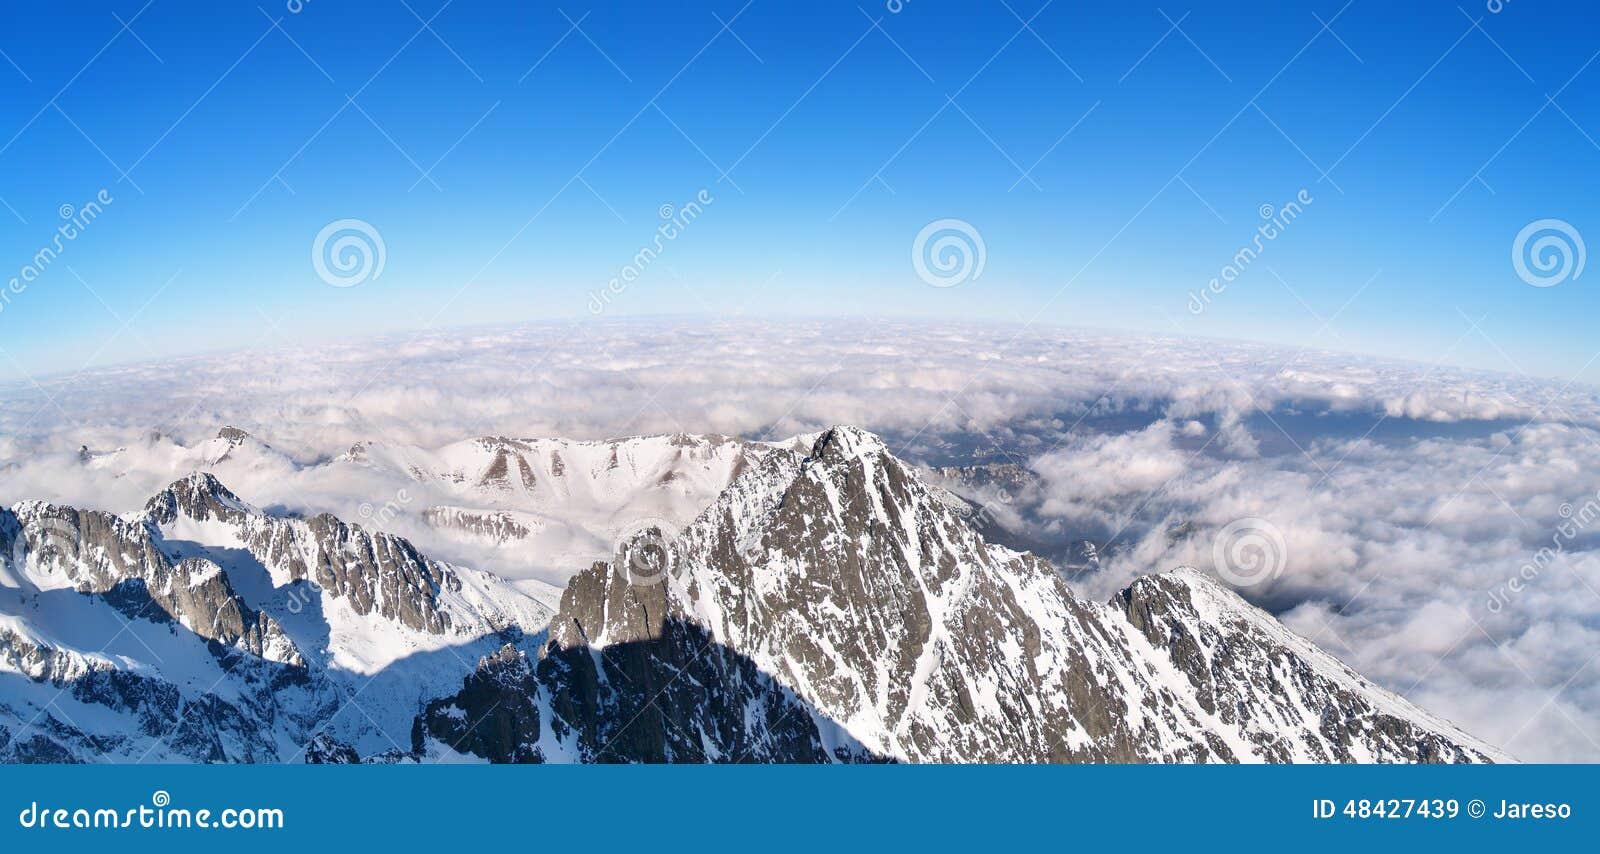 Panoramic view of the High Tatras, Slovakia